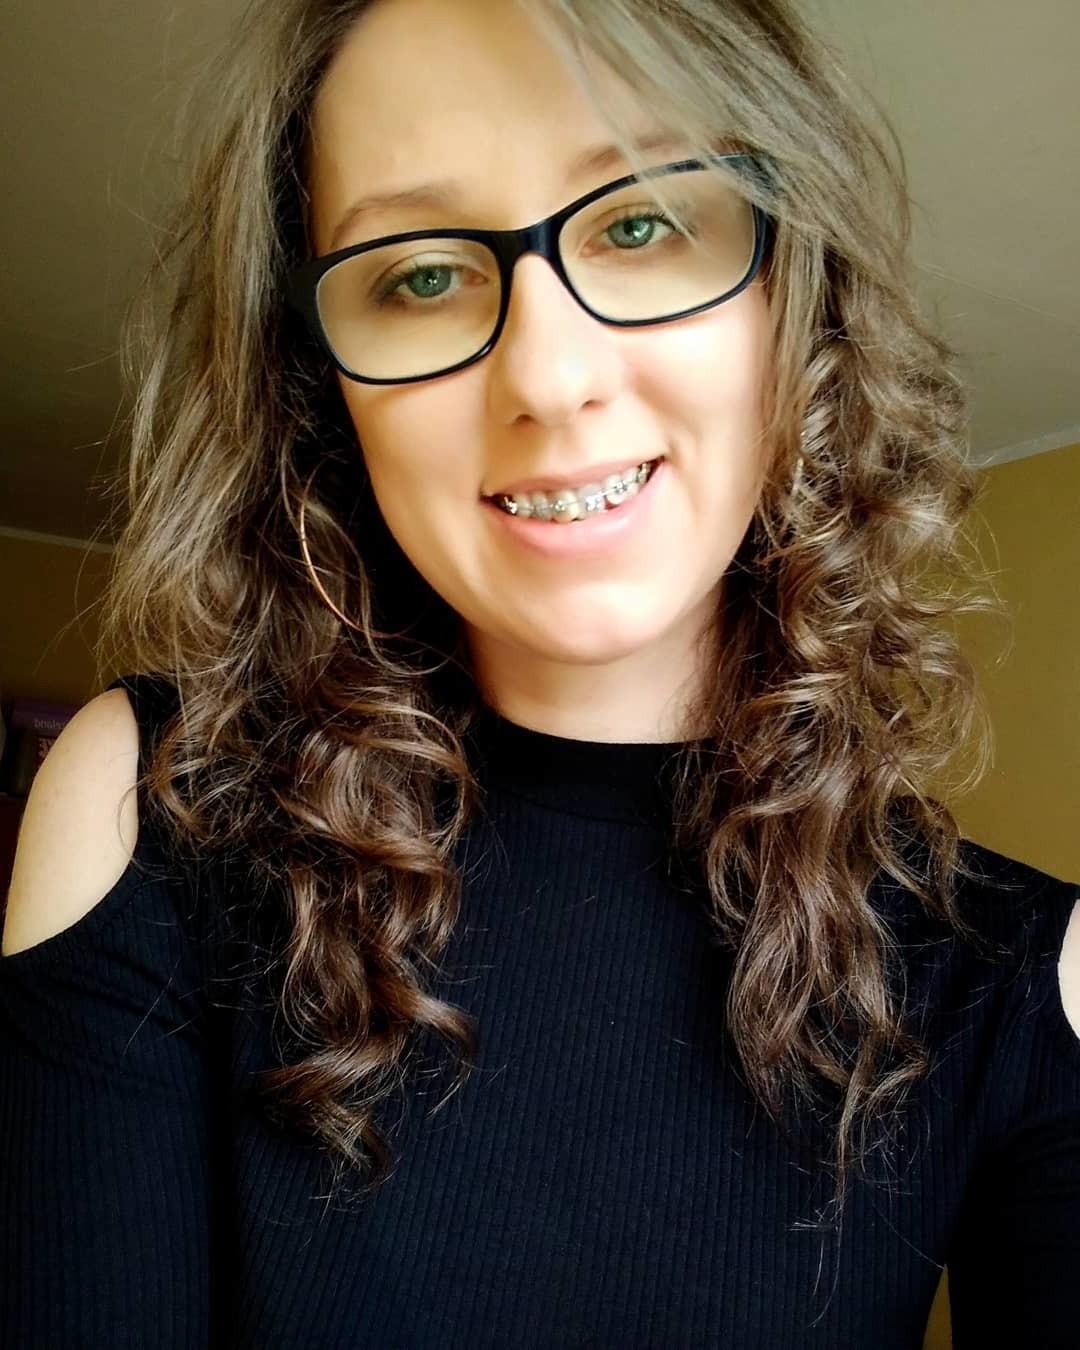 Medium-Length Curly Hair with Layers